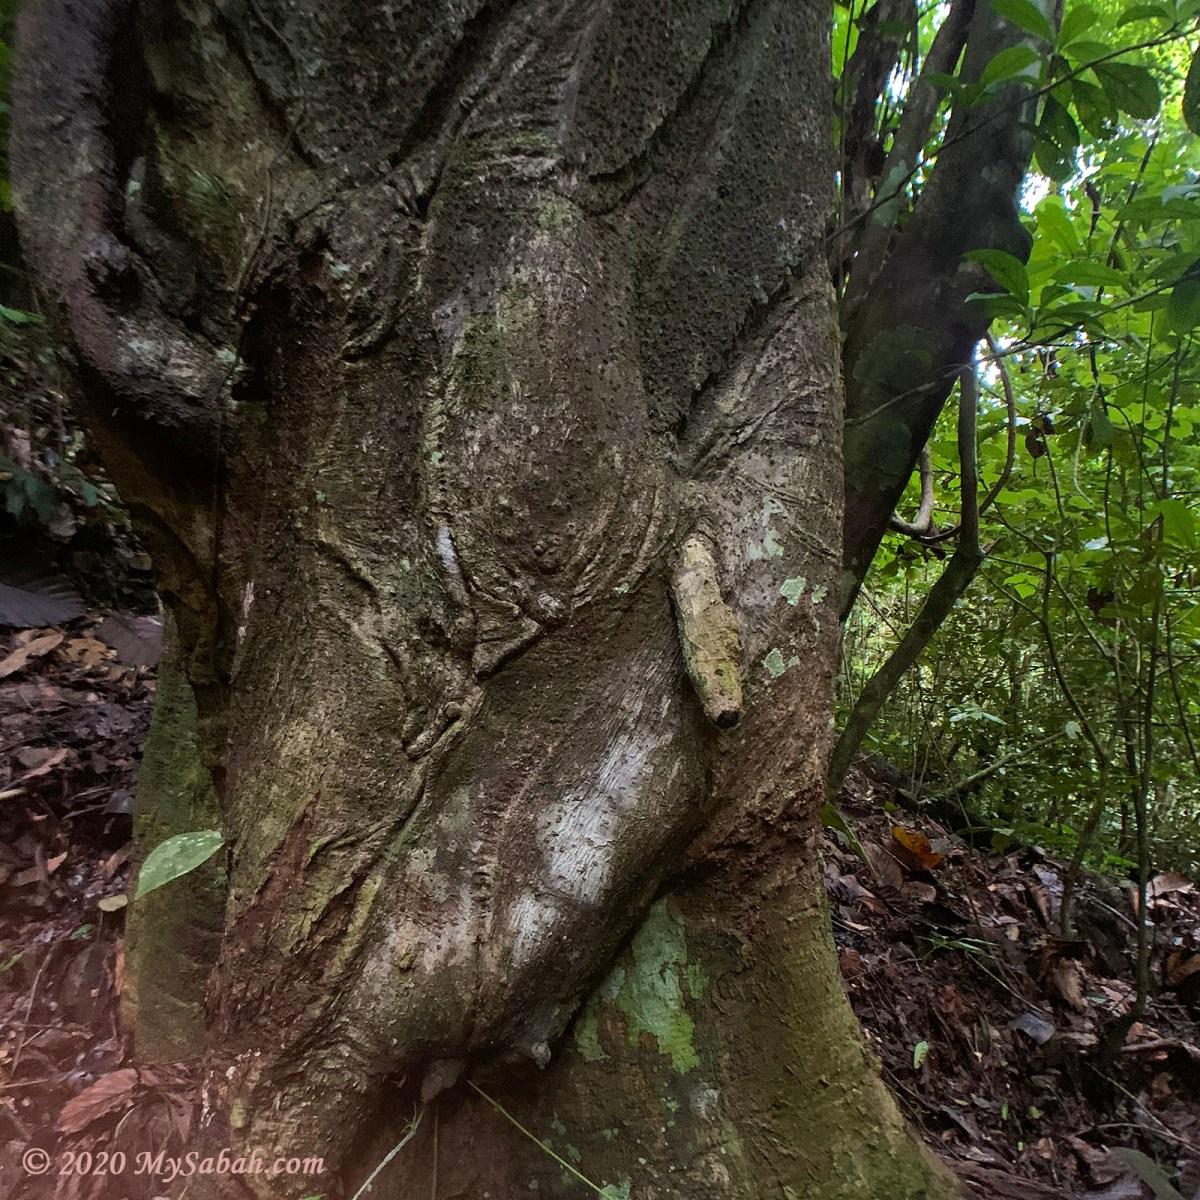 A strange tree near to Batu Nenen (Boobs Rock)